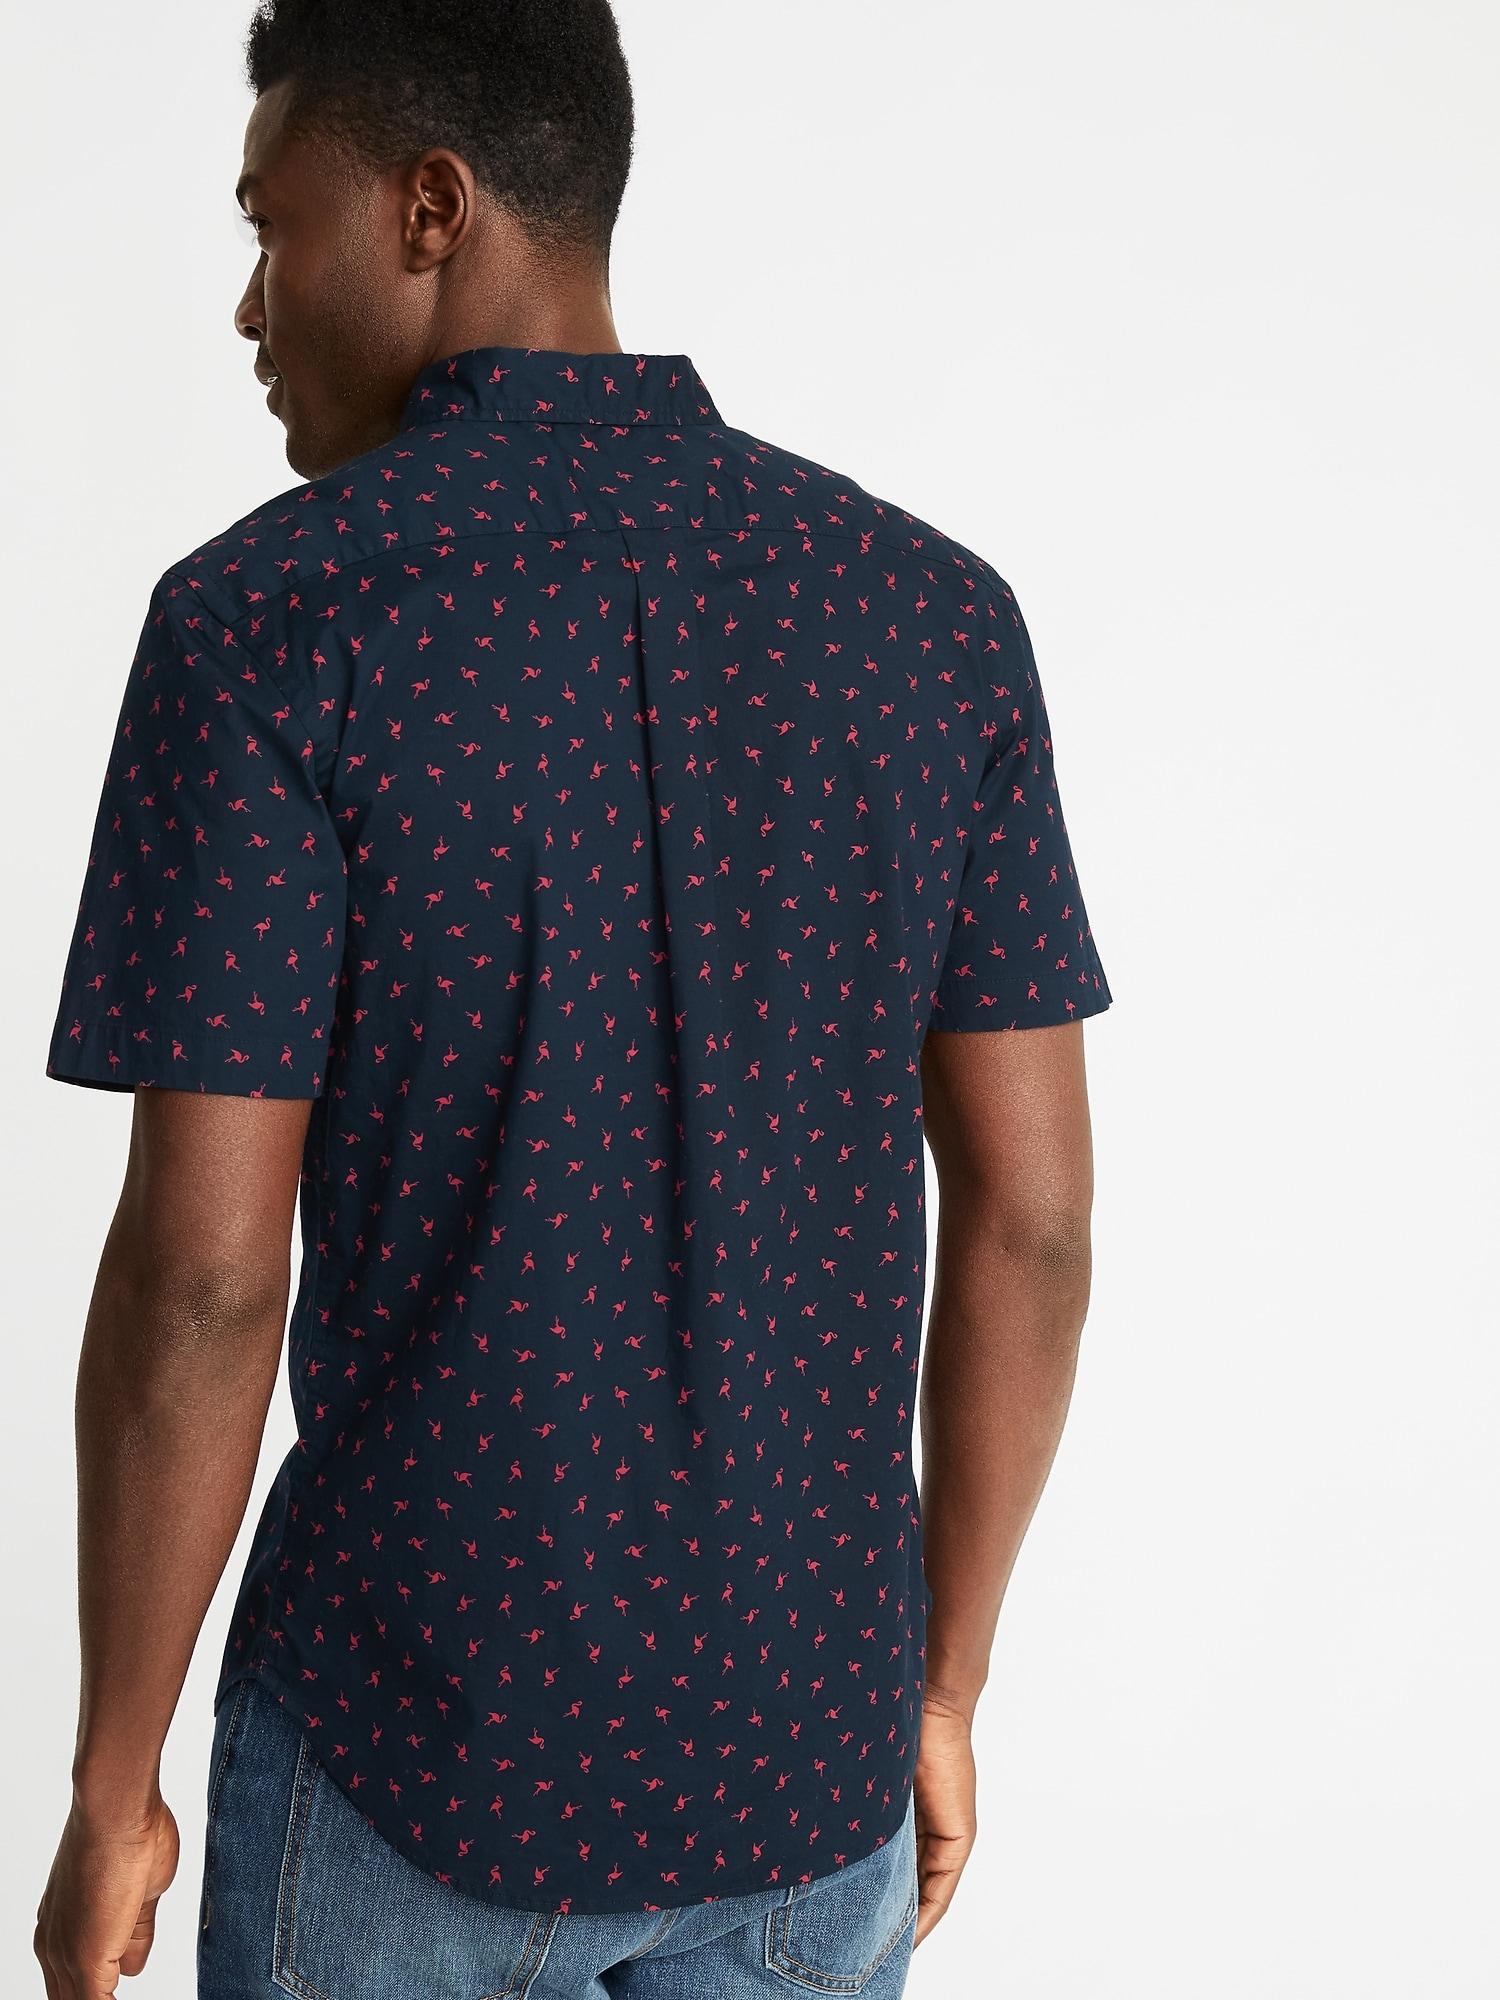 2109ebe614 Slim-Fit Printed Built-In Flex Everyday Shirt for Men ...